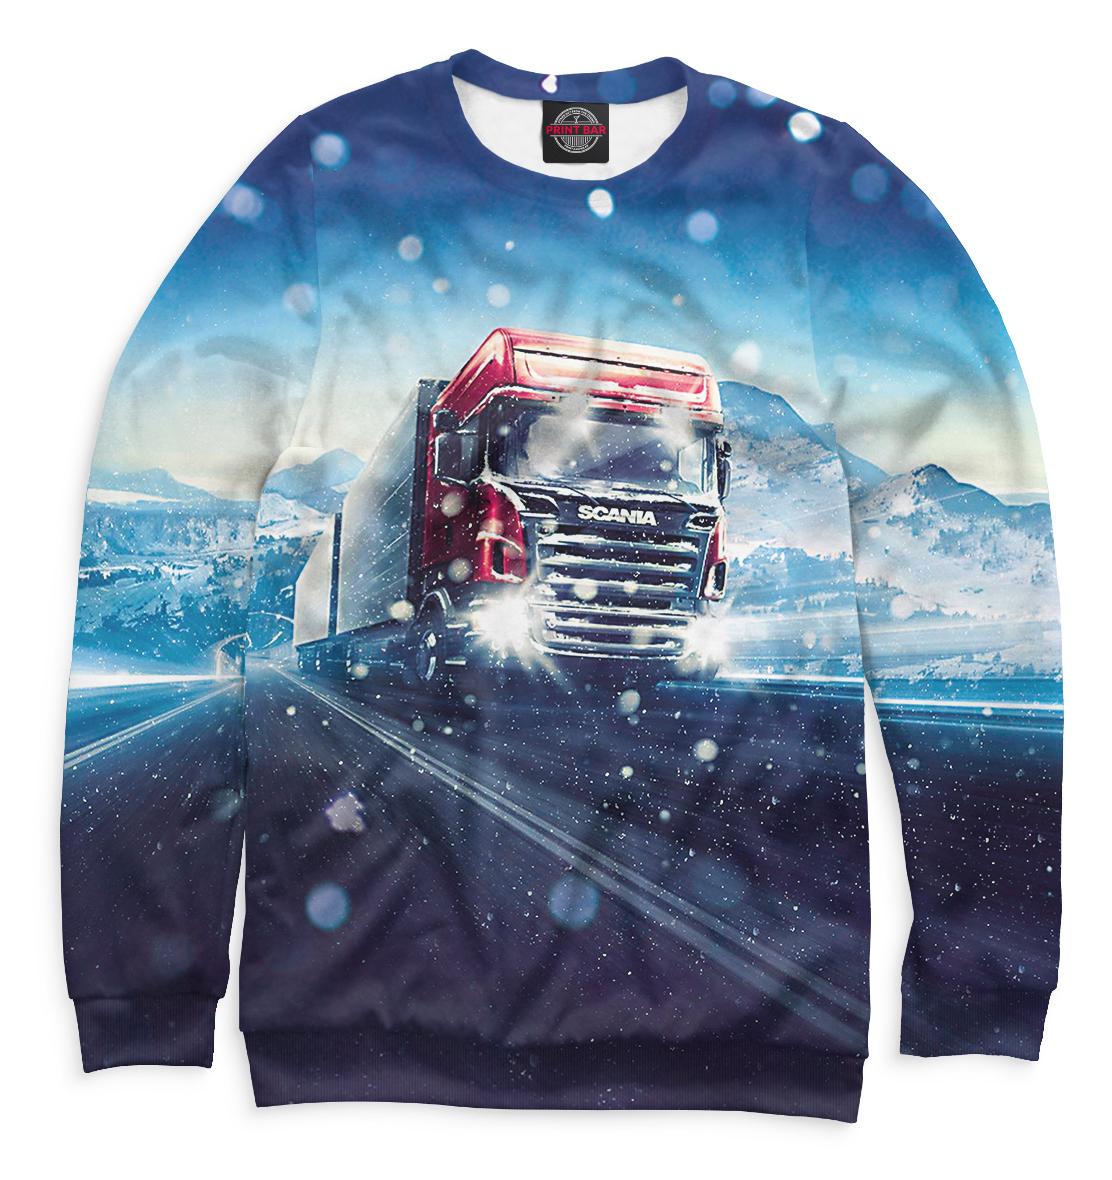 Купить Scania, Printbar, Свитшоты, GRZ-587036-swi-2